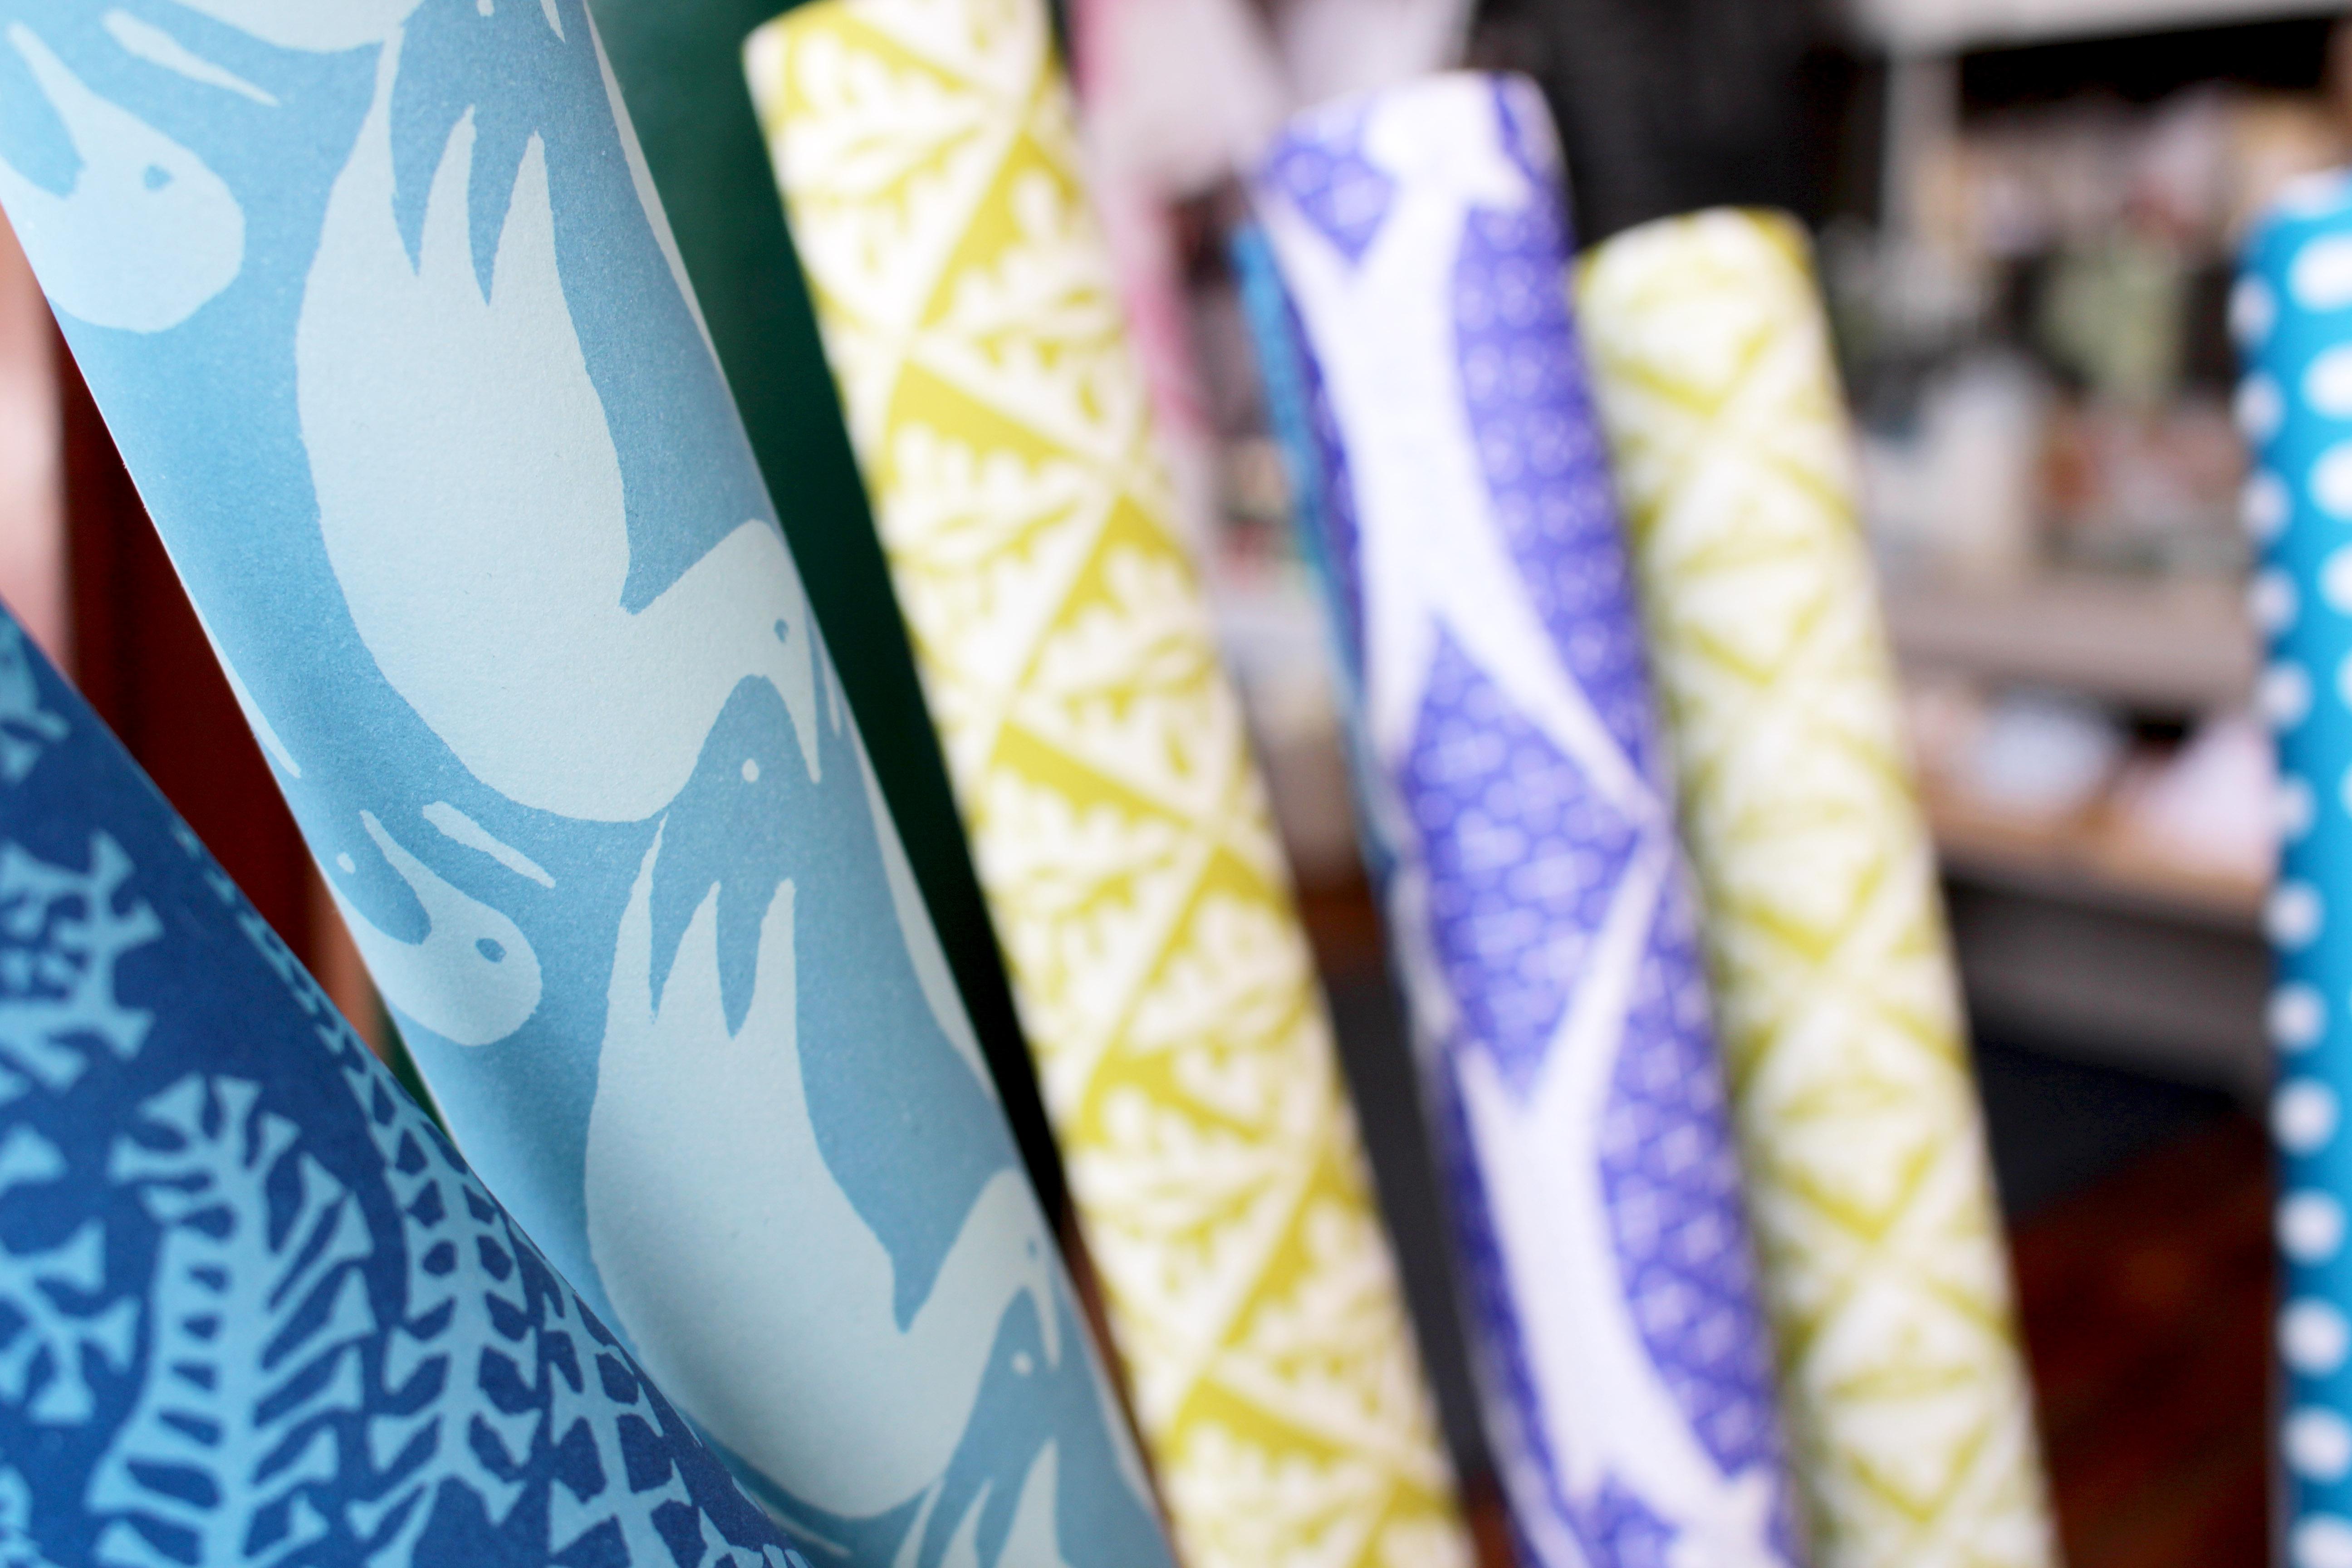 cambridge imprint company wrapping paper